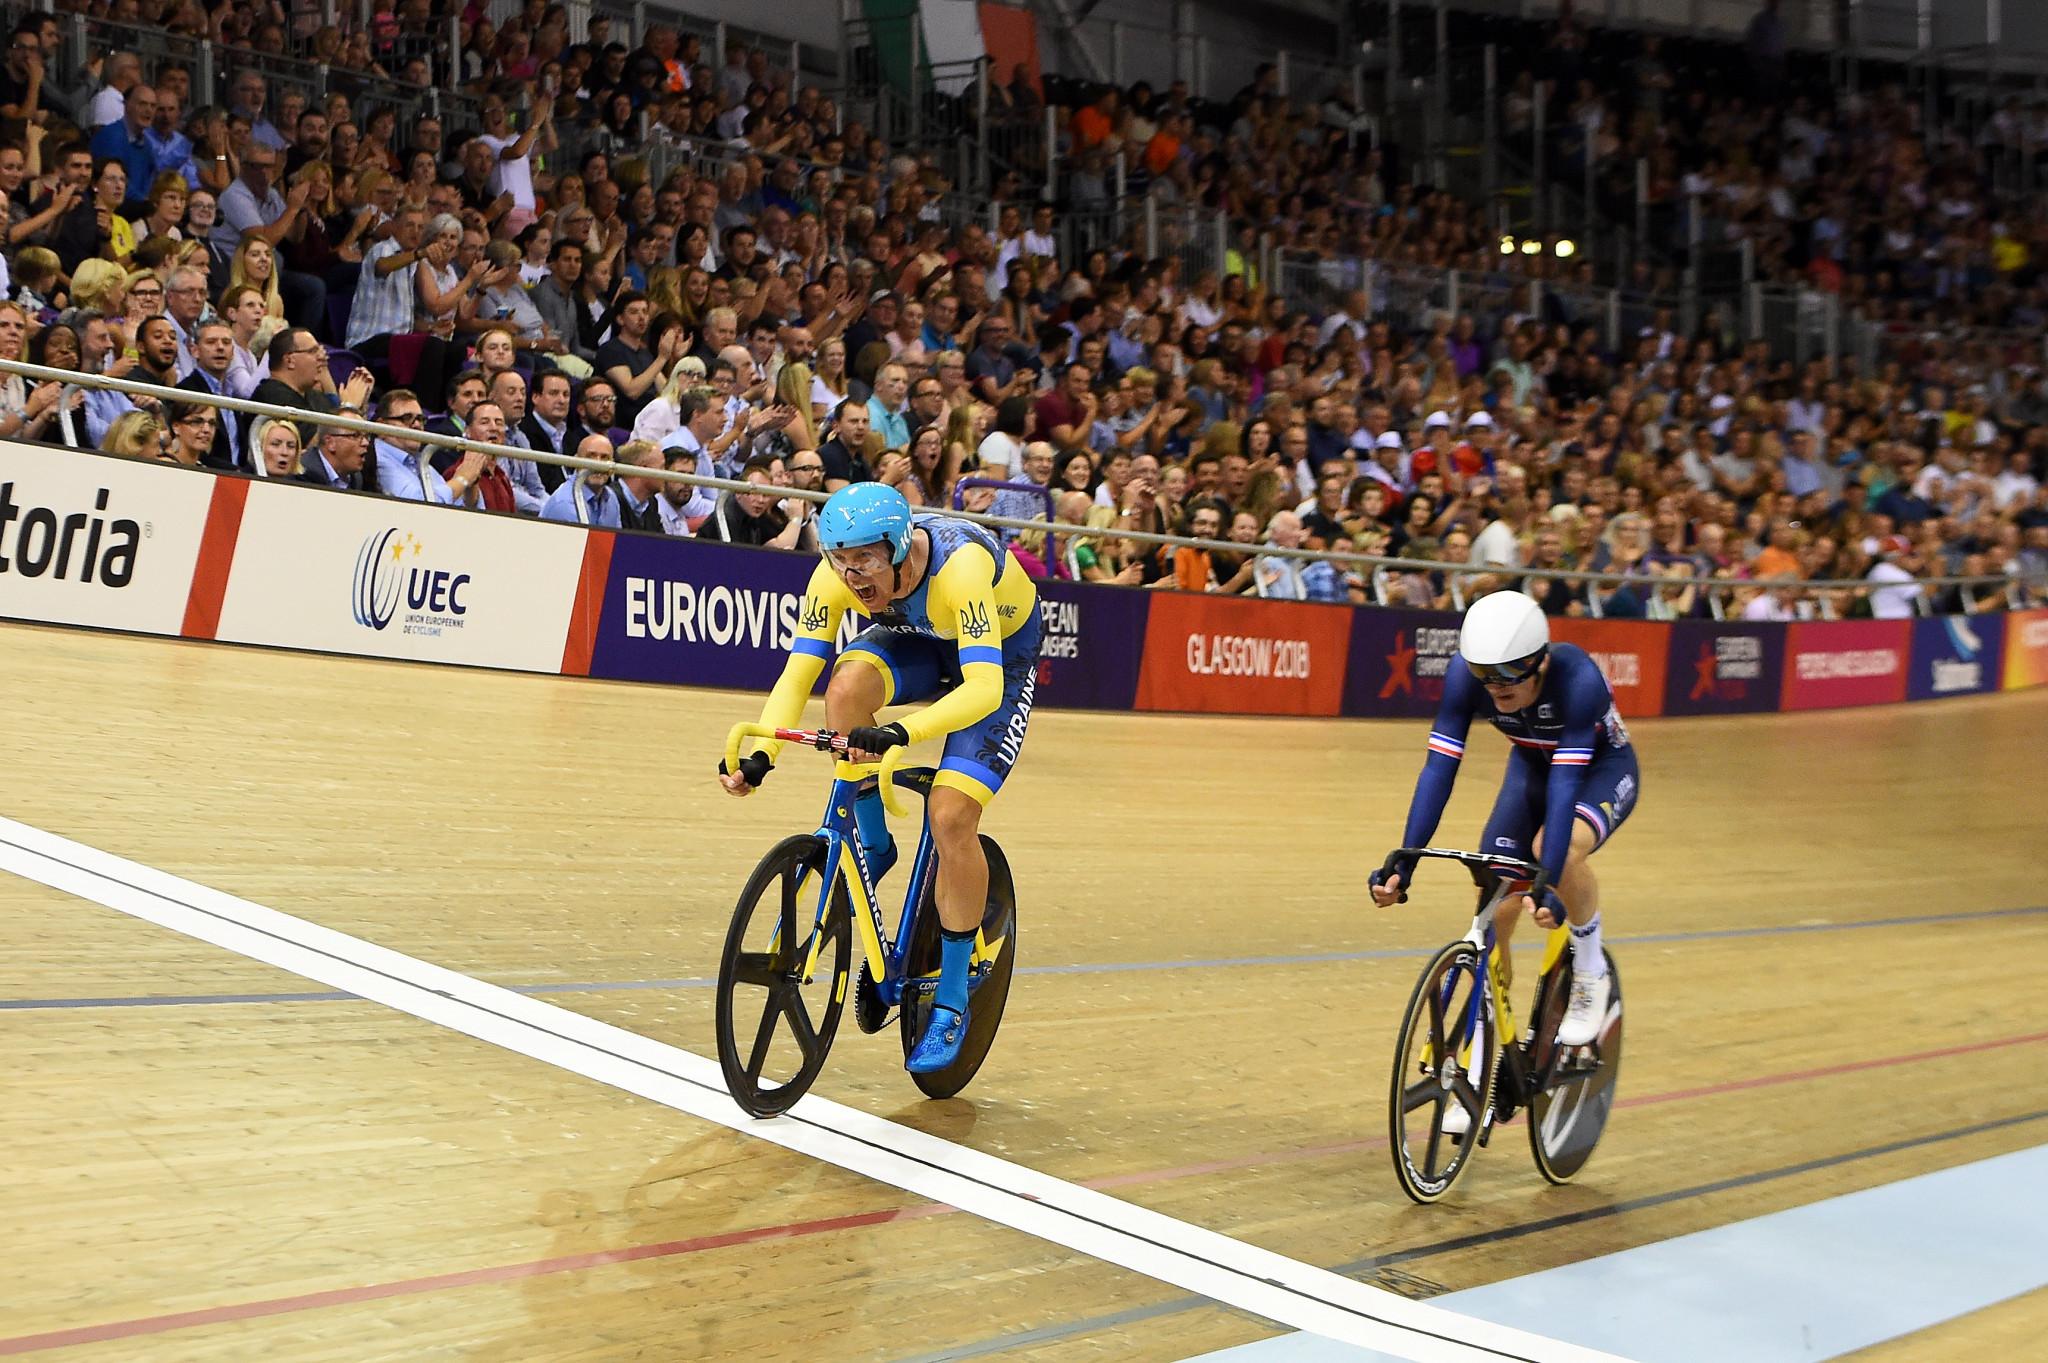 Roman Gladysh of Ukraine edge France's Adrien Garol in the men's scratch race ©Getty Images